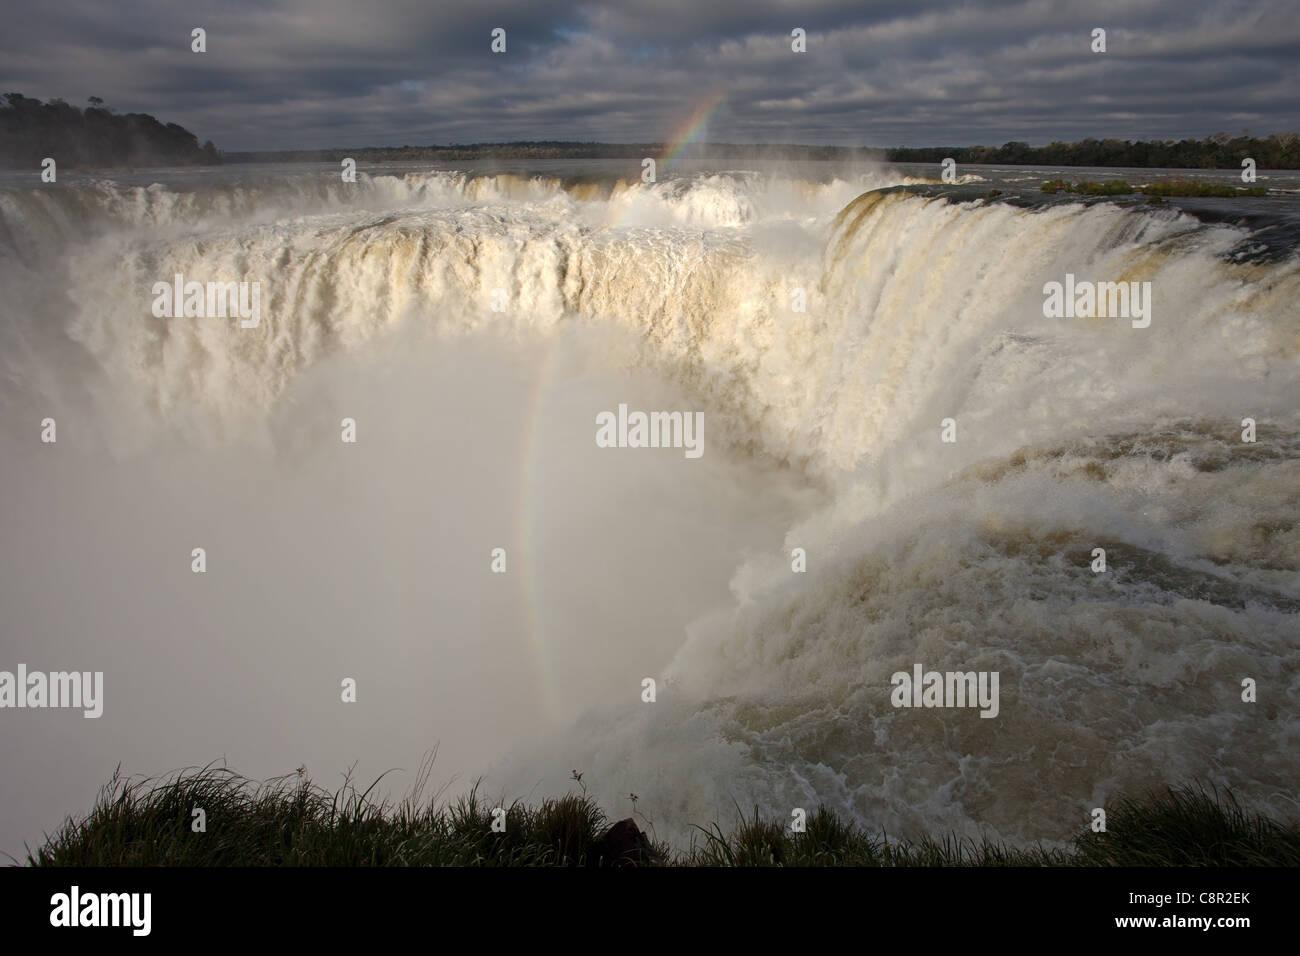 Iguazu Falls: The Devil's Throat - Stock Image